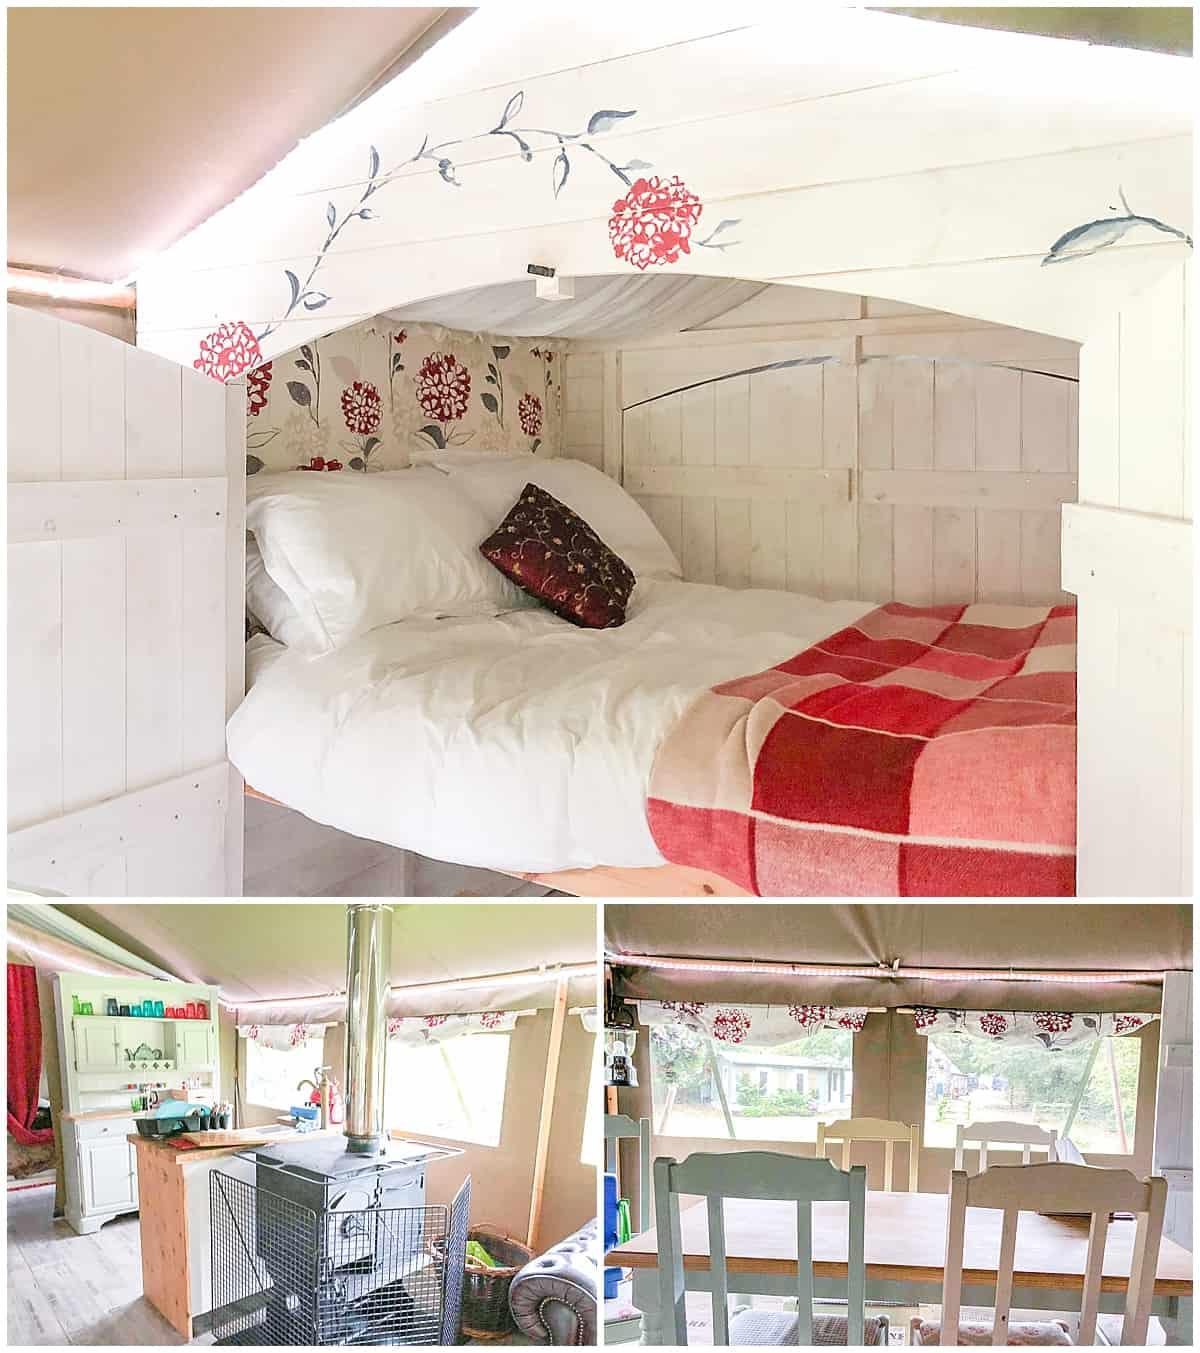 Inside glamping tent at Felin Geri in Wales